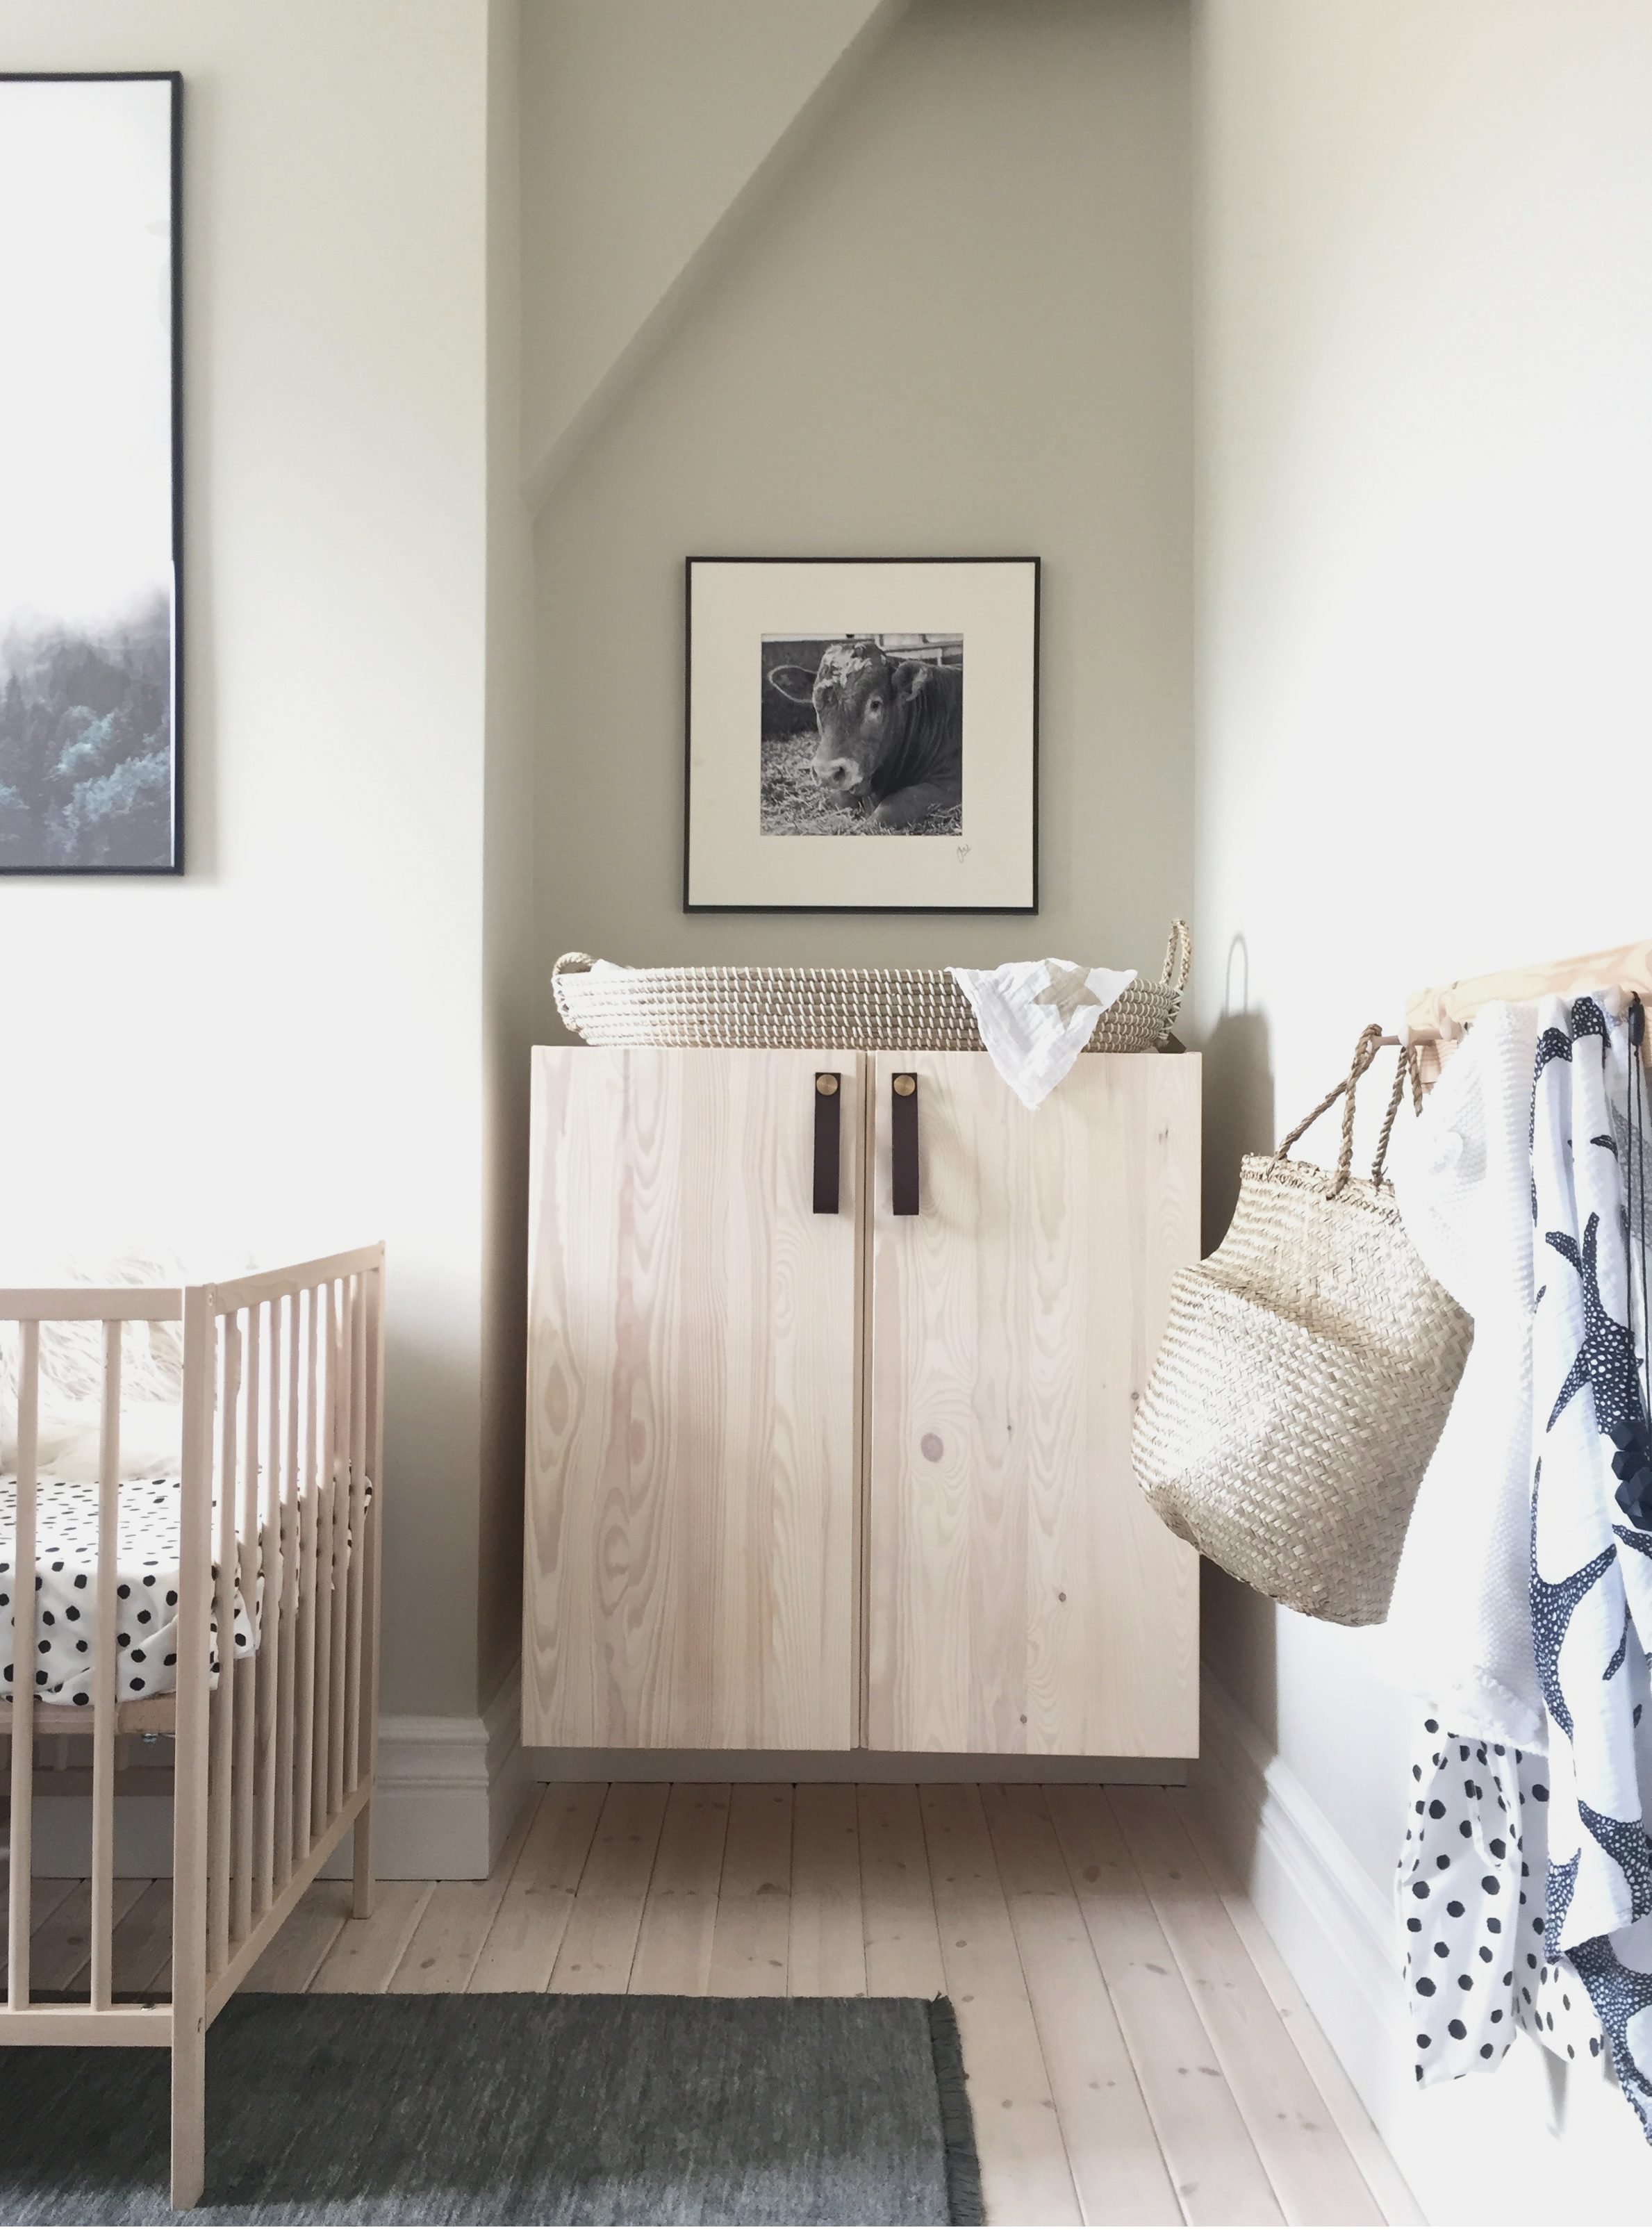 27 Best Ivar images | Ikea, Interior